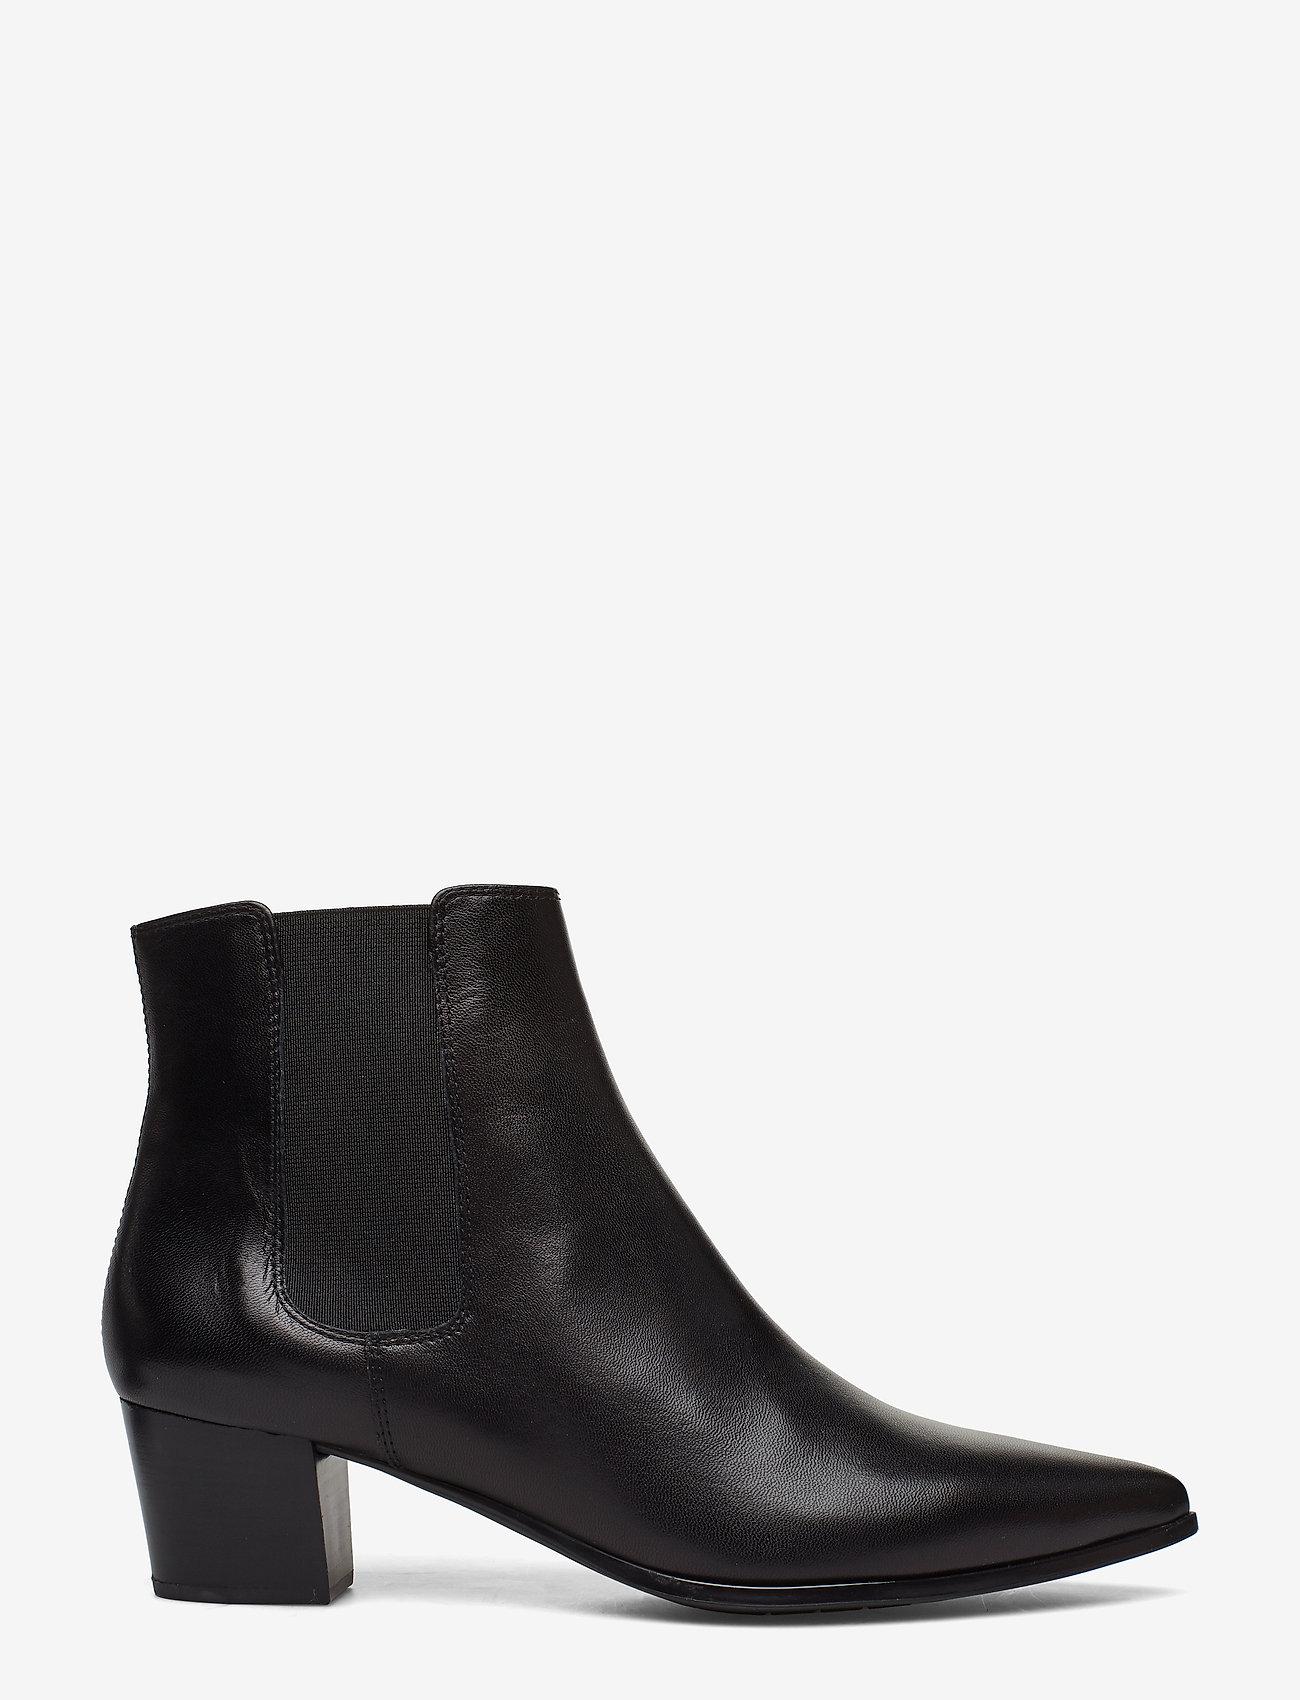 Unisa Jiste_f19_na - Boots